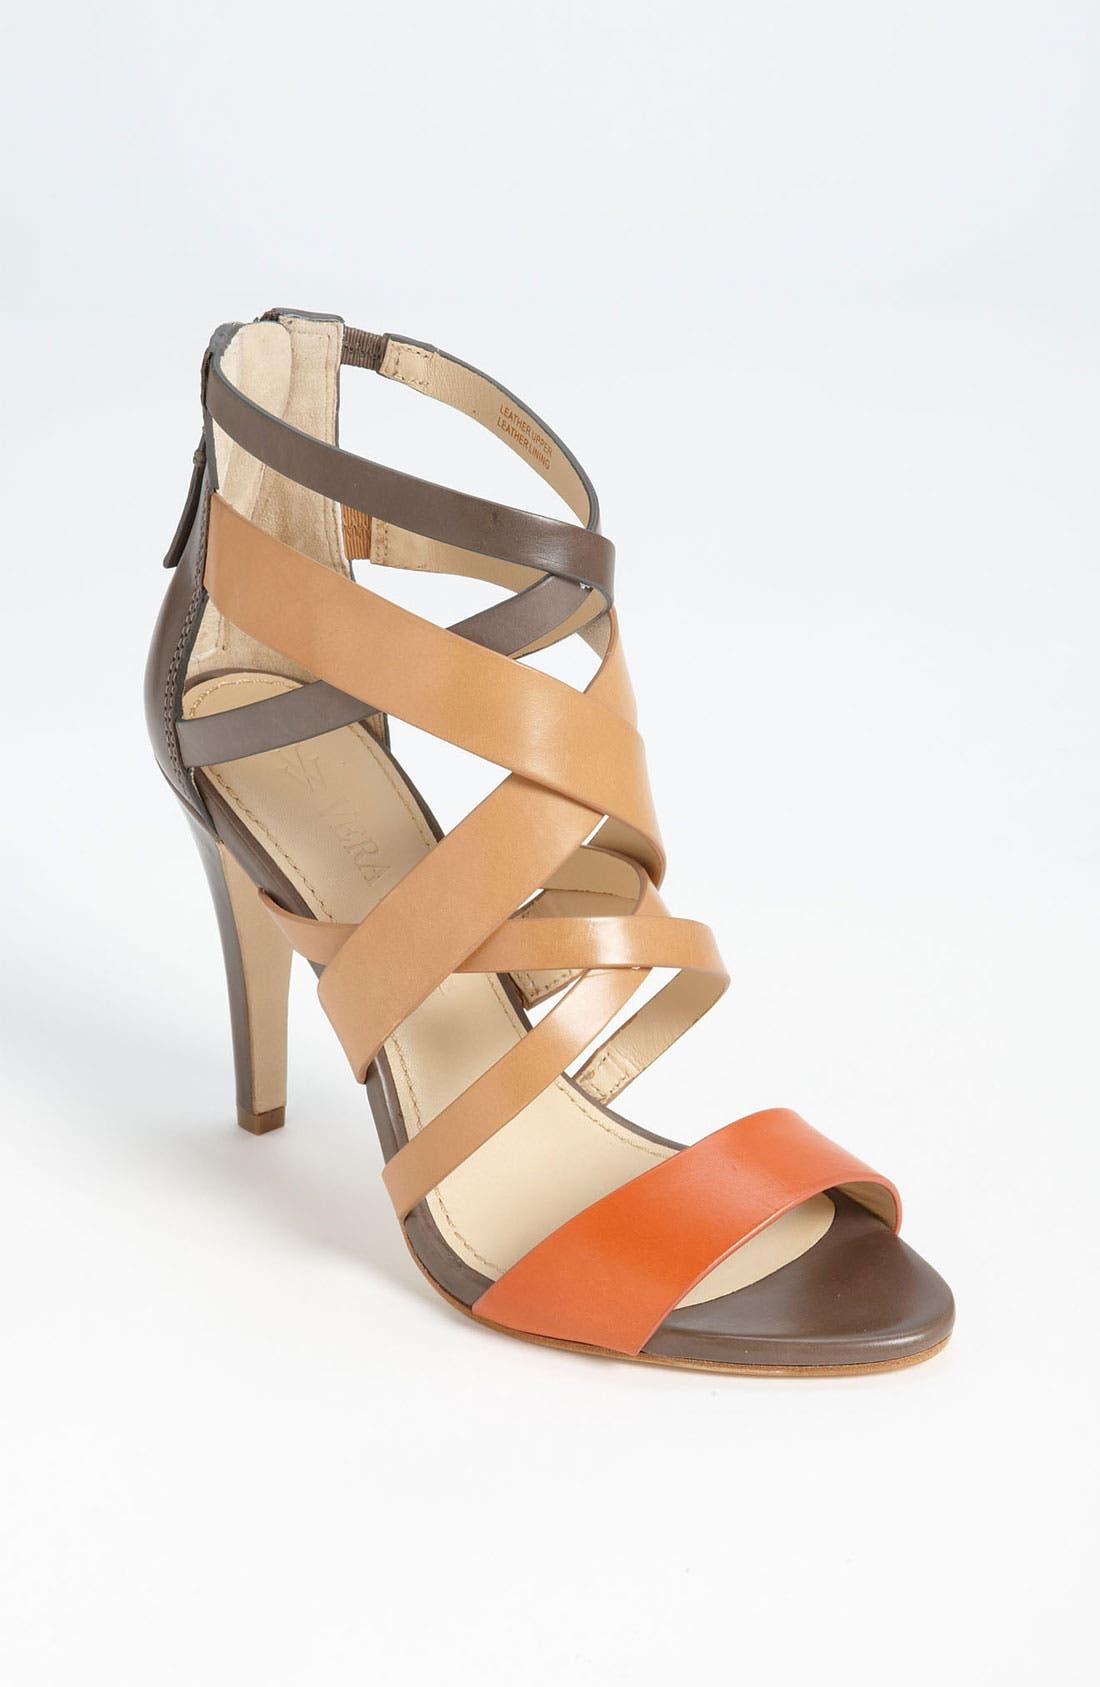 Alternate Image 1 Selected - Vera Wang Footwear 'Hinda High' Sandal (Online Only)